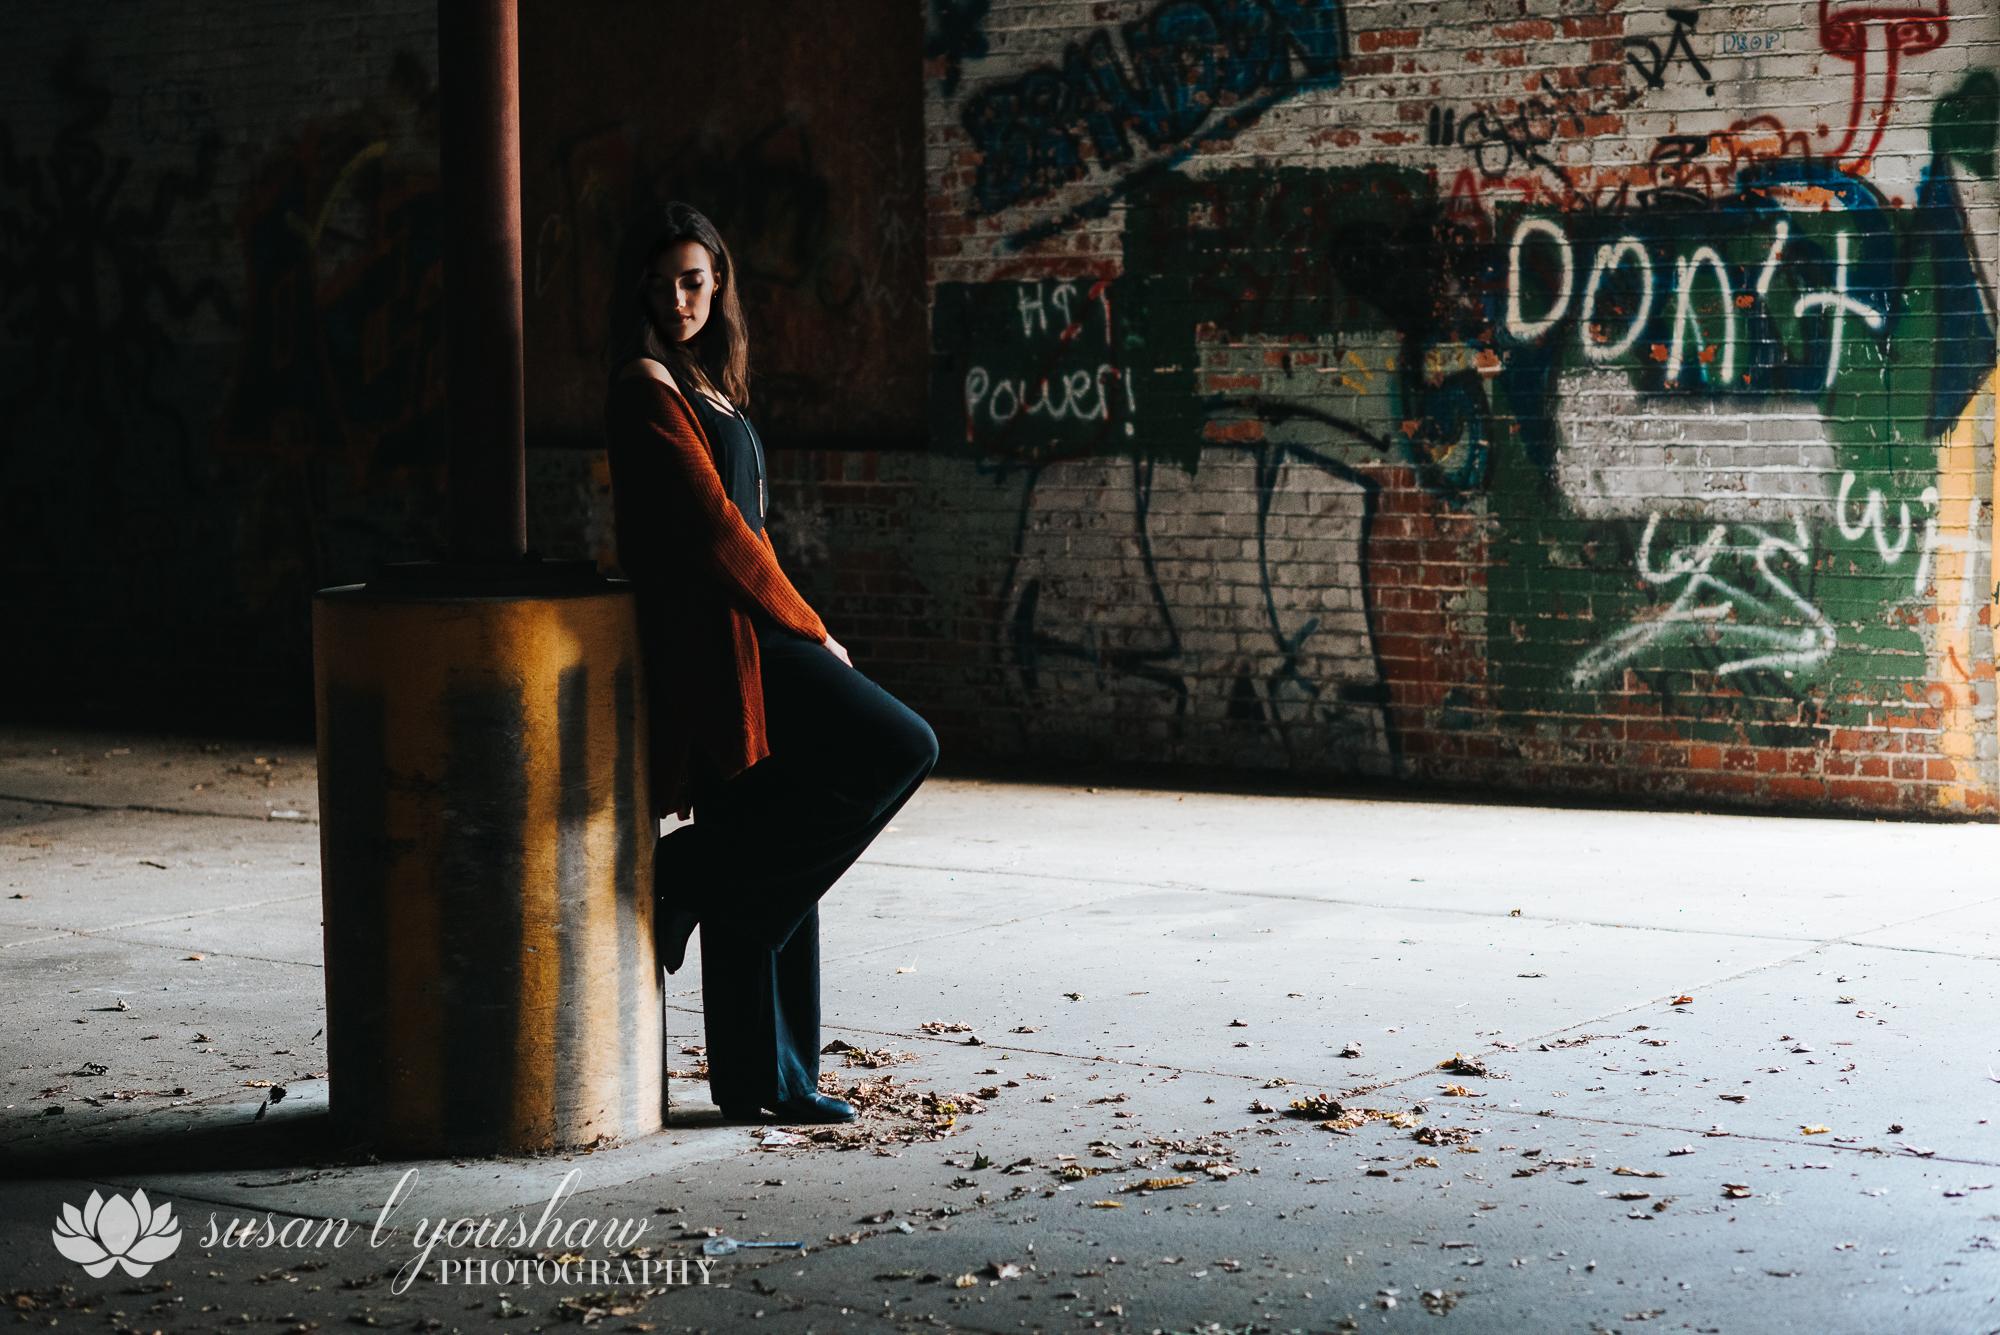 BLOG Lilly Viego 10-16-2018 SLY Photography LLC-3.jpg